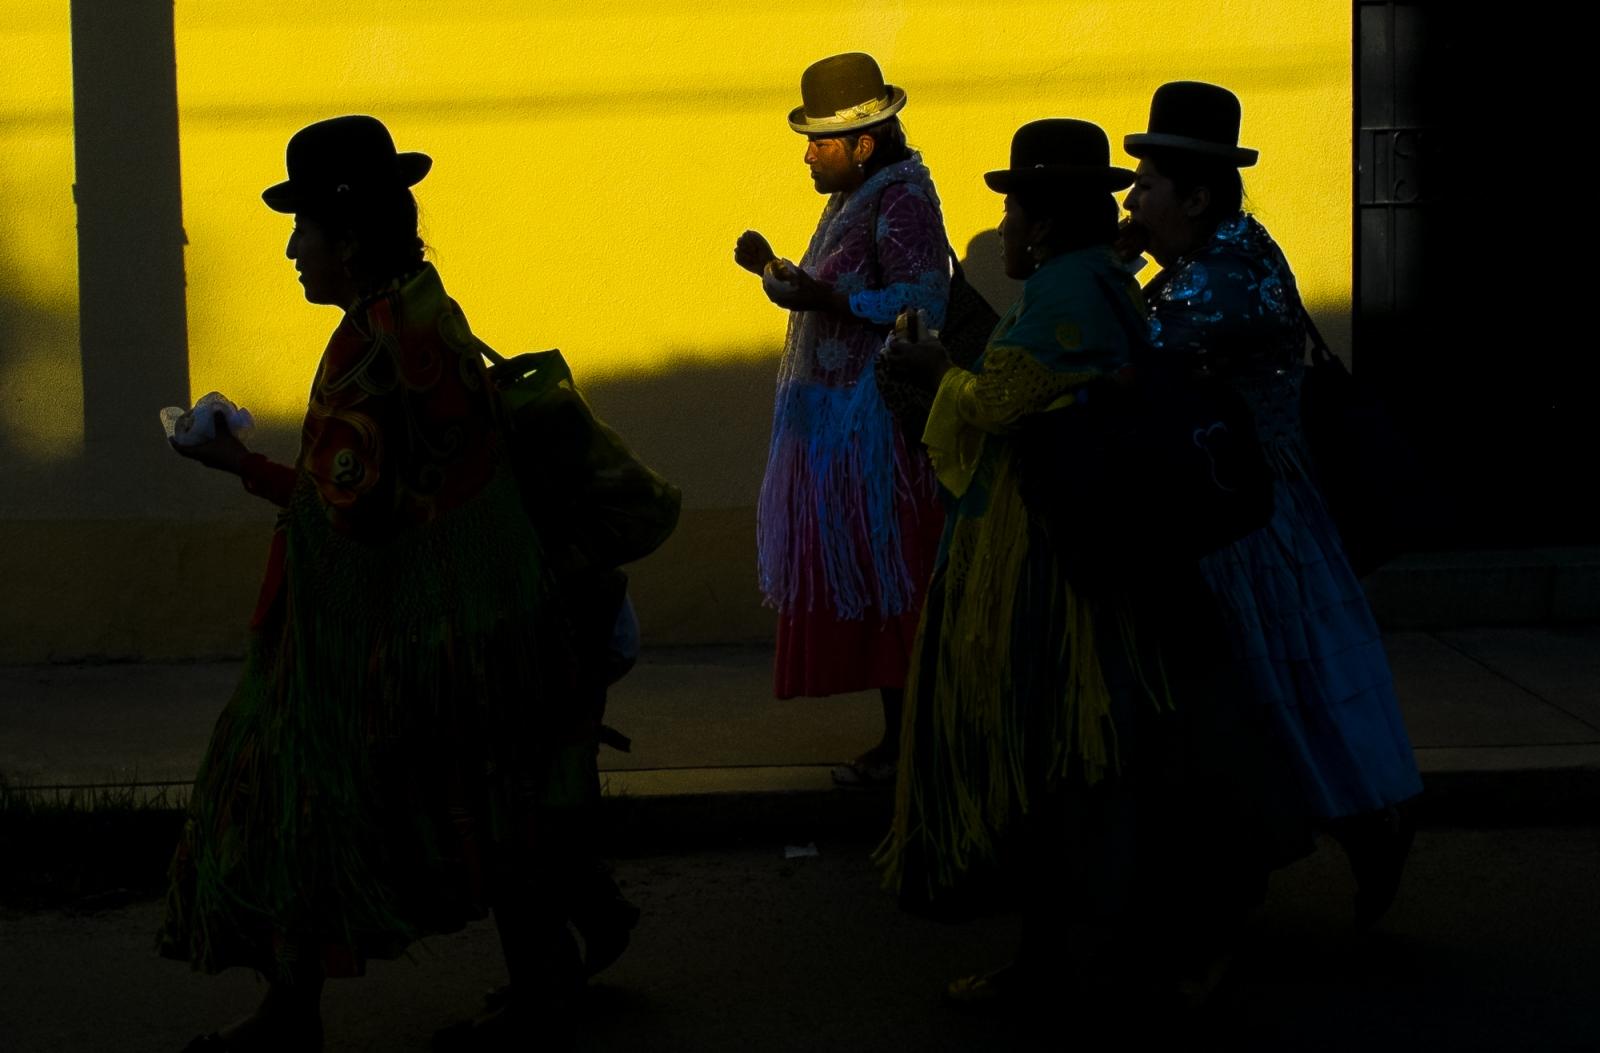 Art and Documentary Photography - Loading 20-EL-2014-BOL-LP-CHOL-1140.jpg